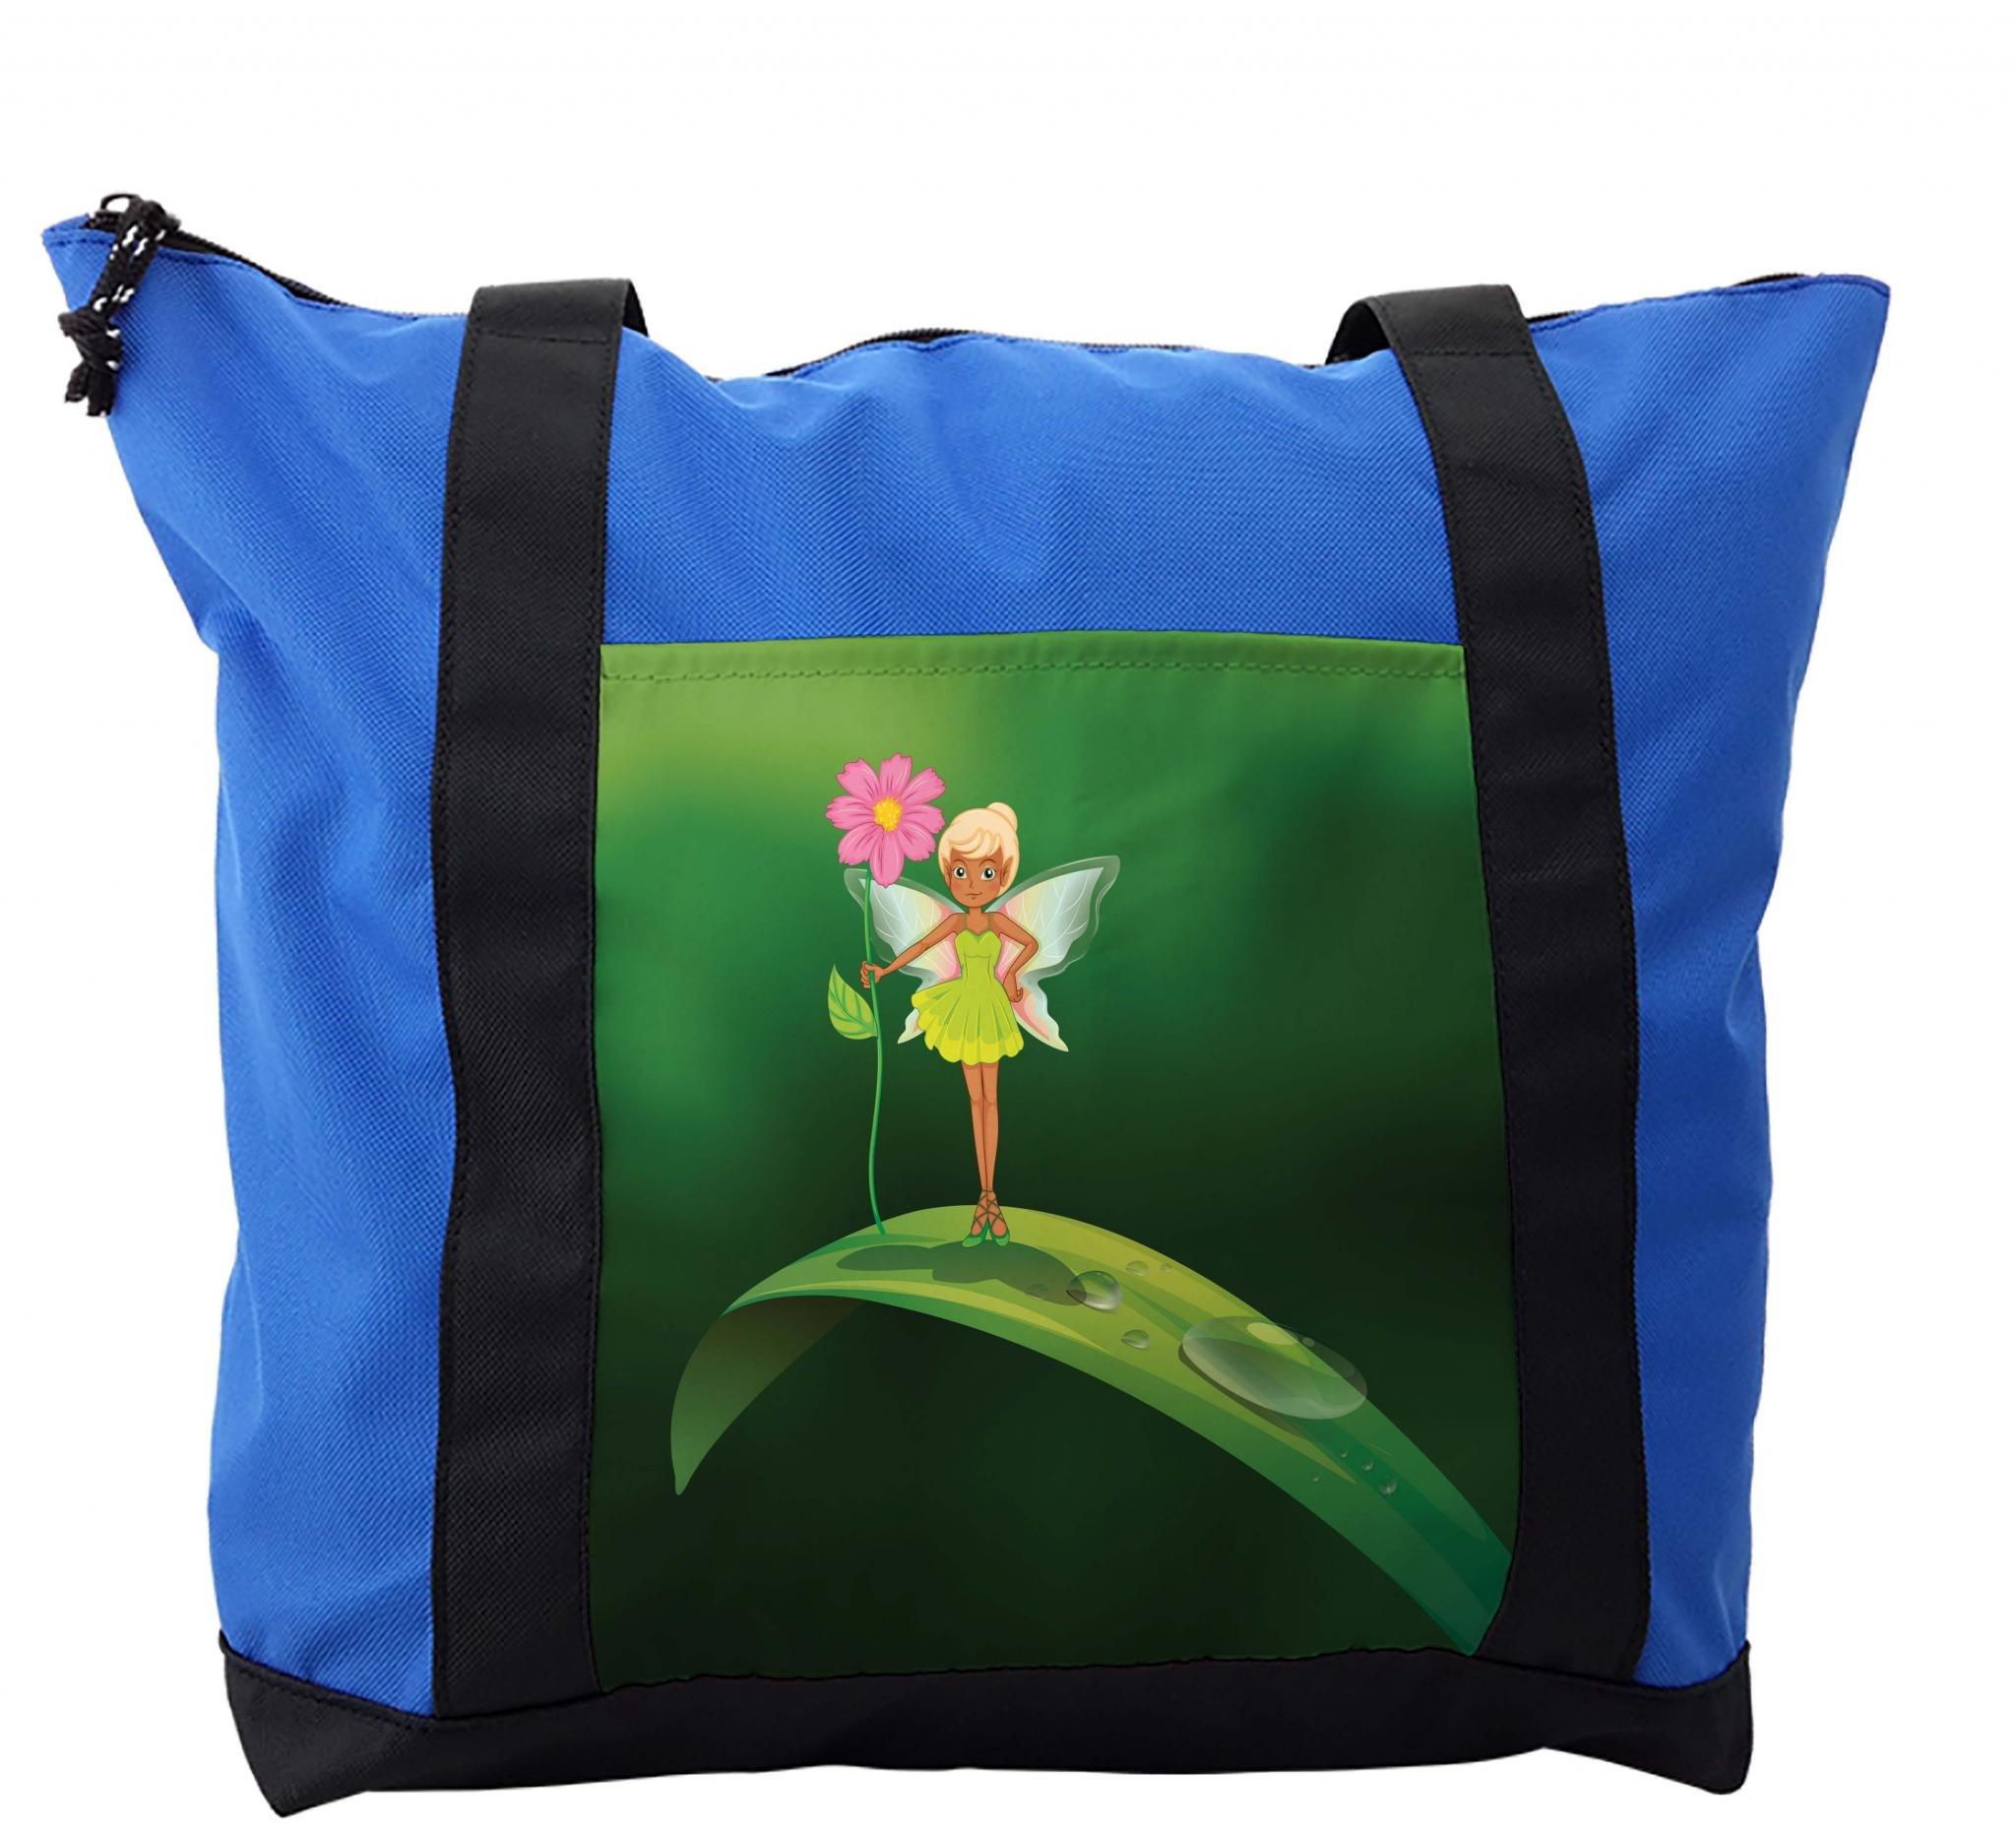 Lunarable Kids Girls Shoulder Bag, Fairy Standing on a Leaf, Durable with Zipper